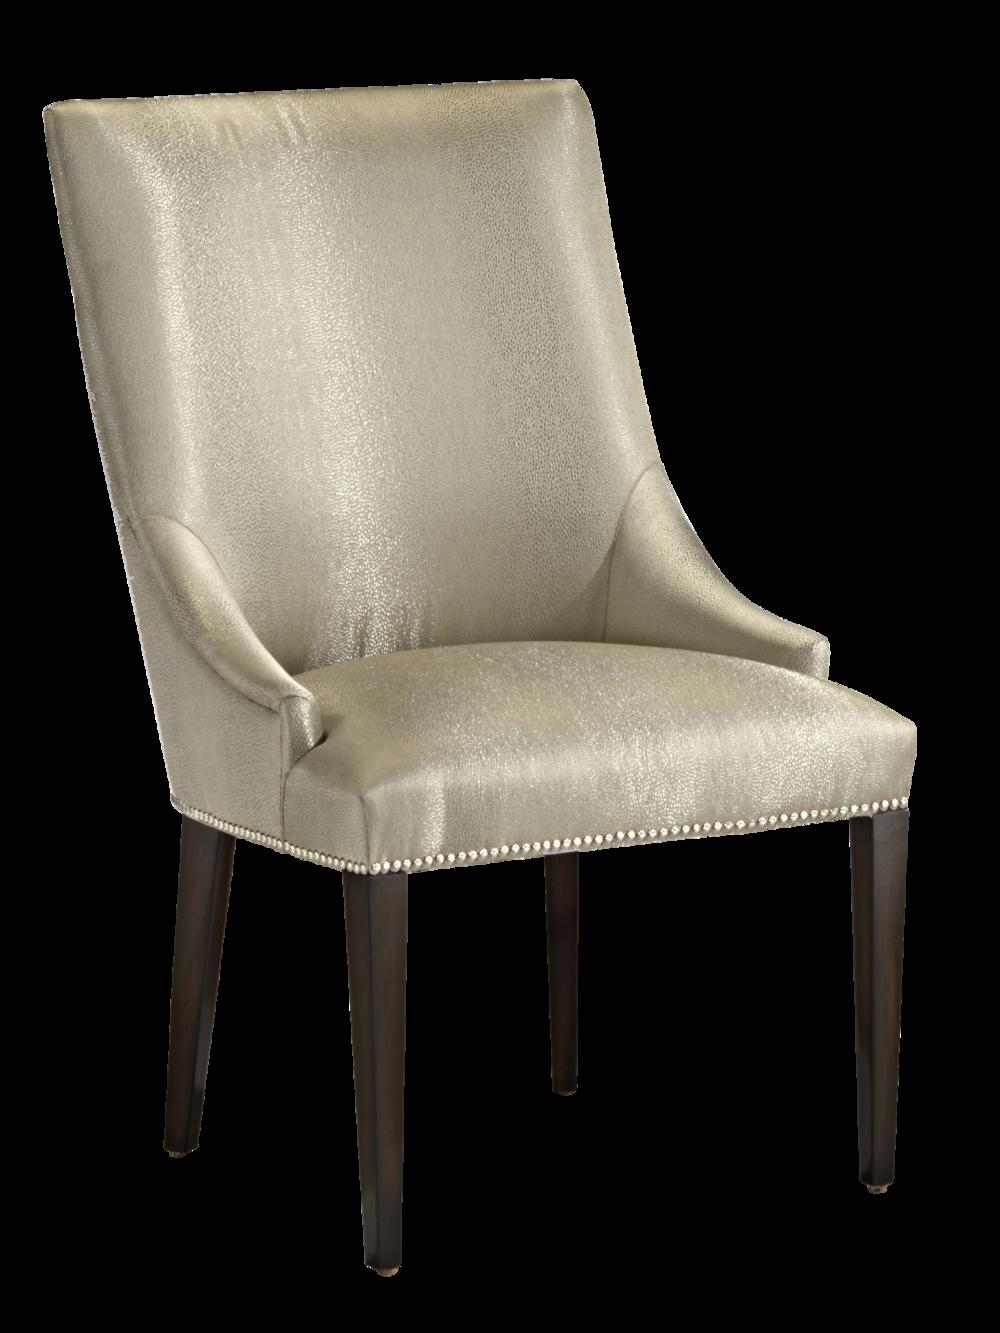 Marge Carson - Venice Beach Side Chair